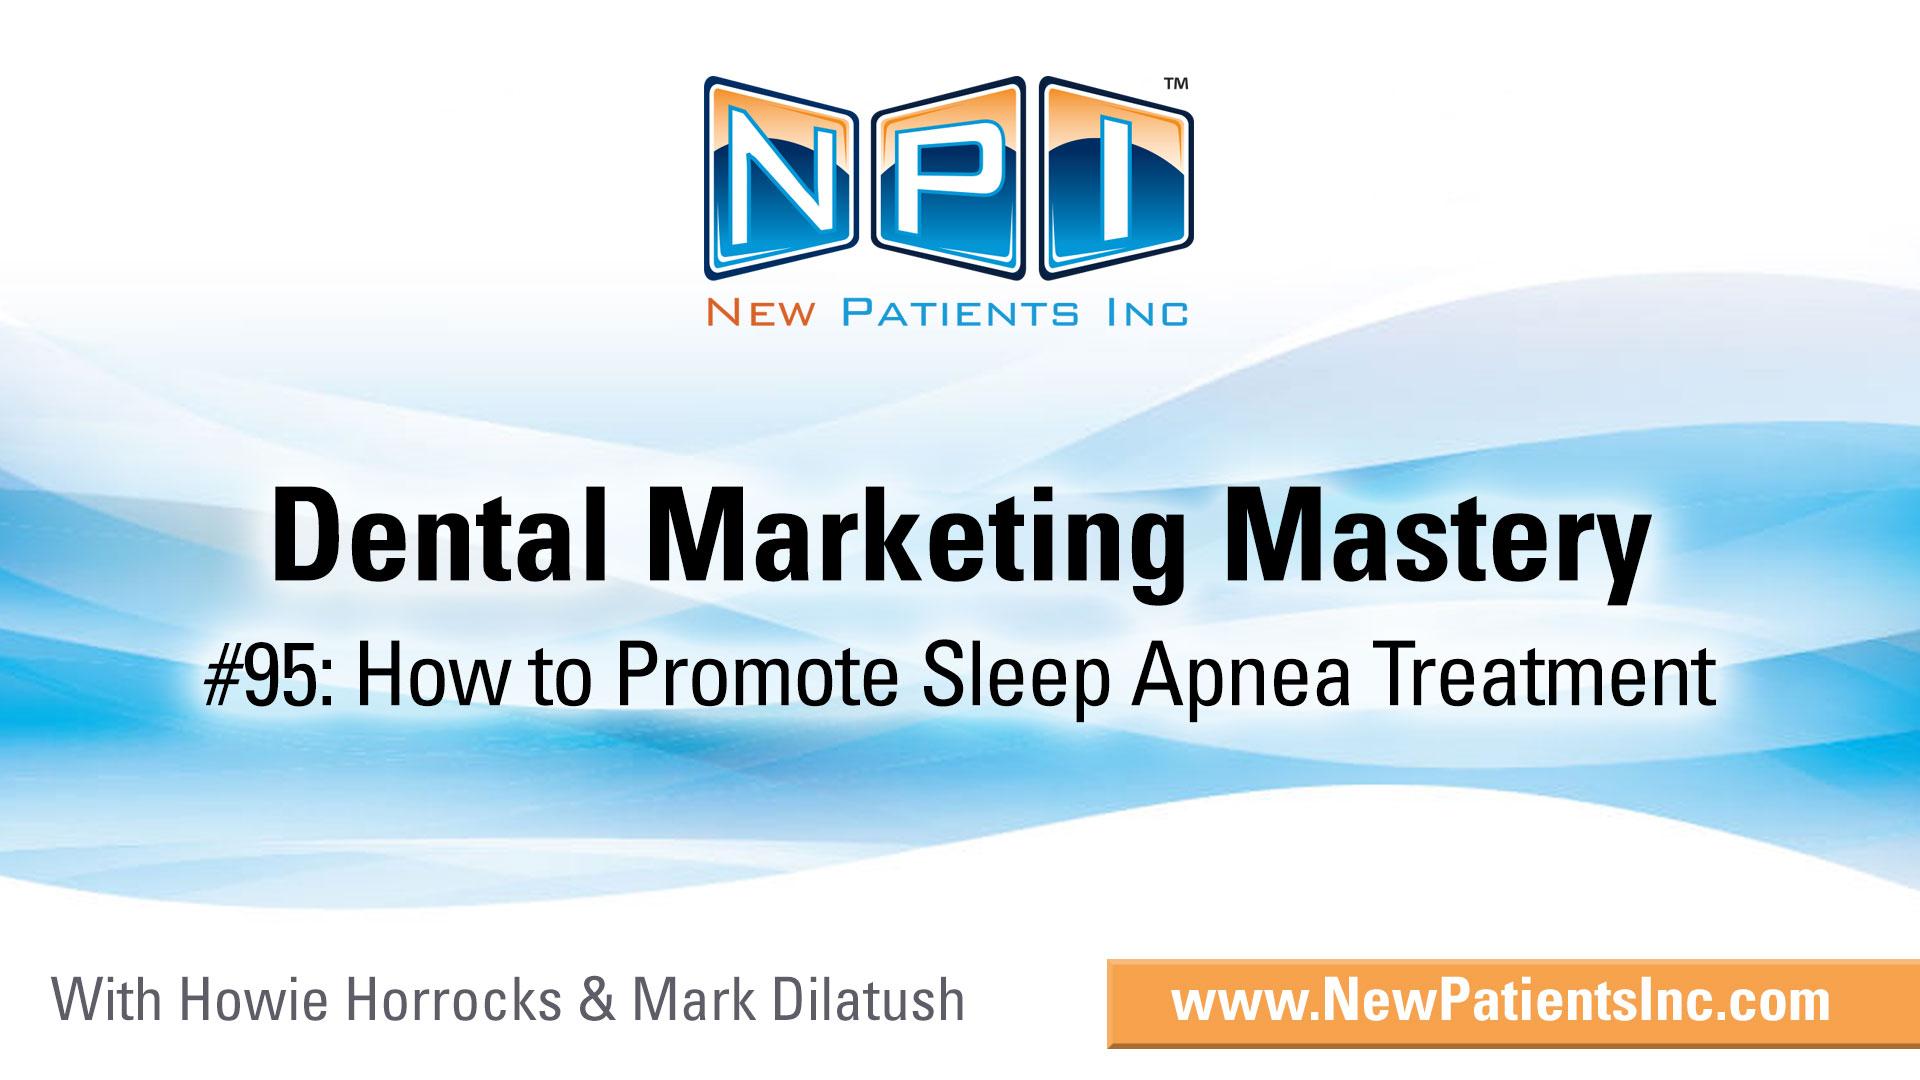 Sleep Apnea Marketing Guide - How to Promote Sleep Apnea Treatment?